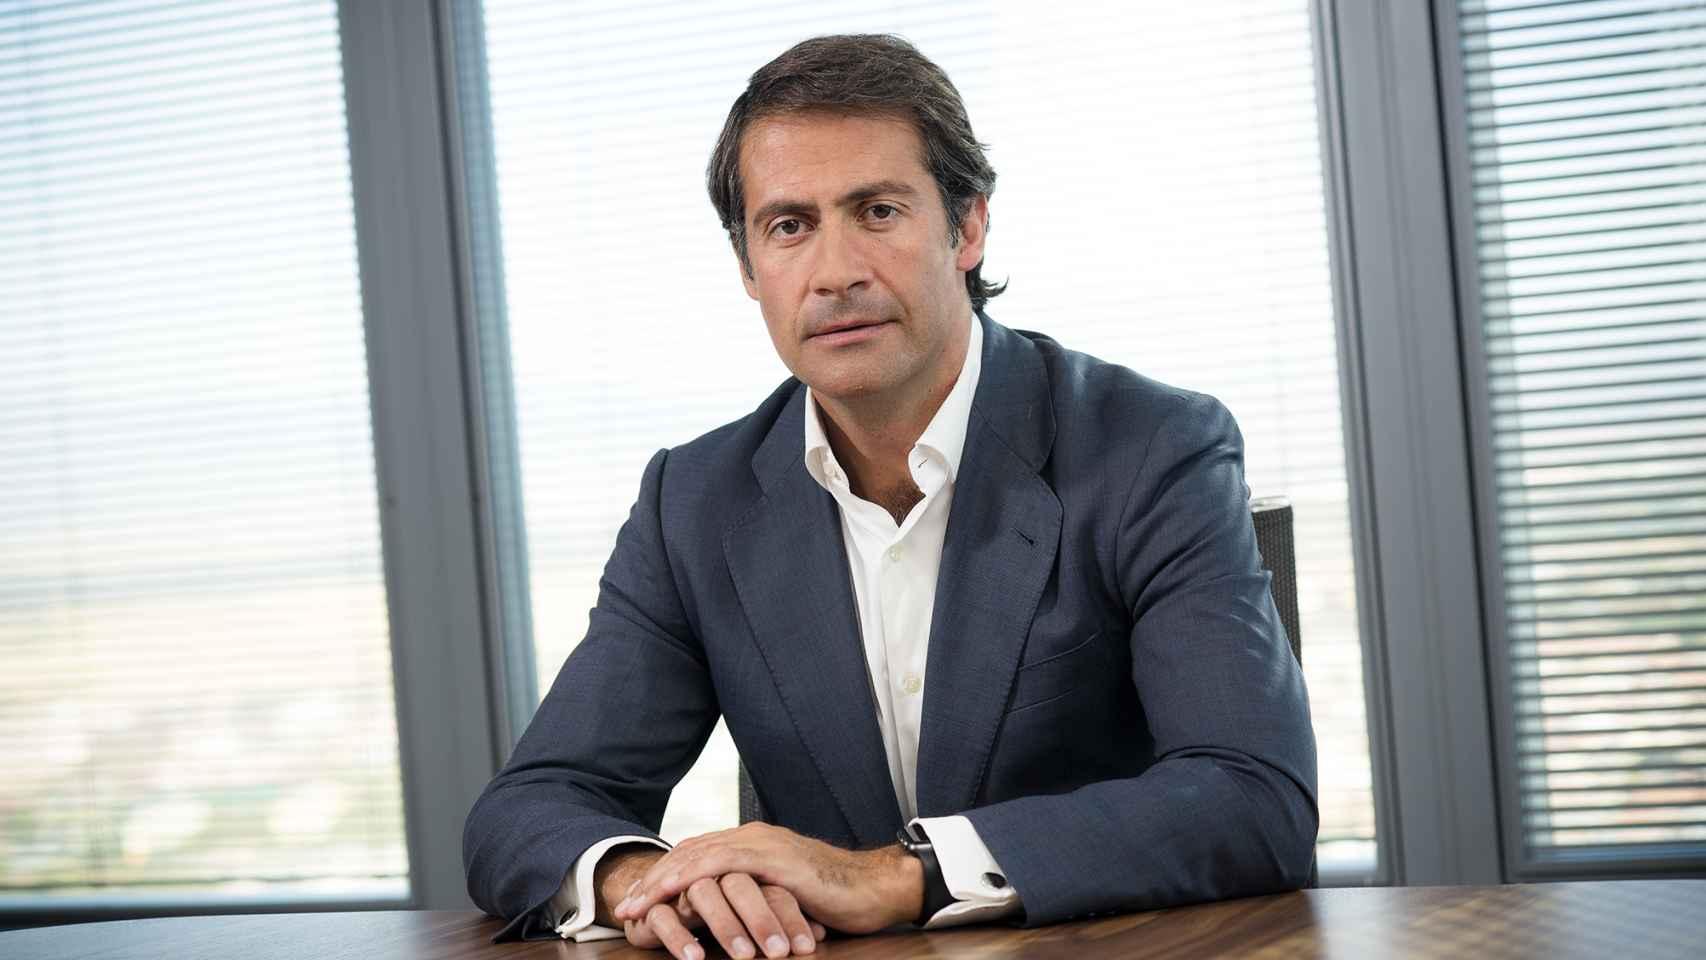 Juan José Cano, consejero delegado de KPMG a partir del 1 de enero de 2019.